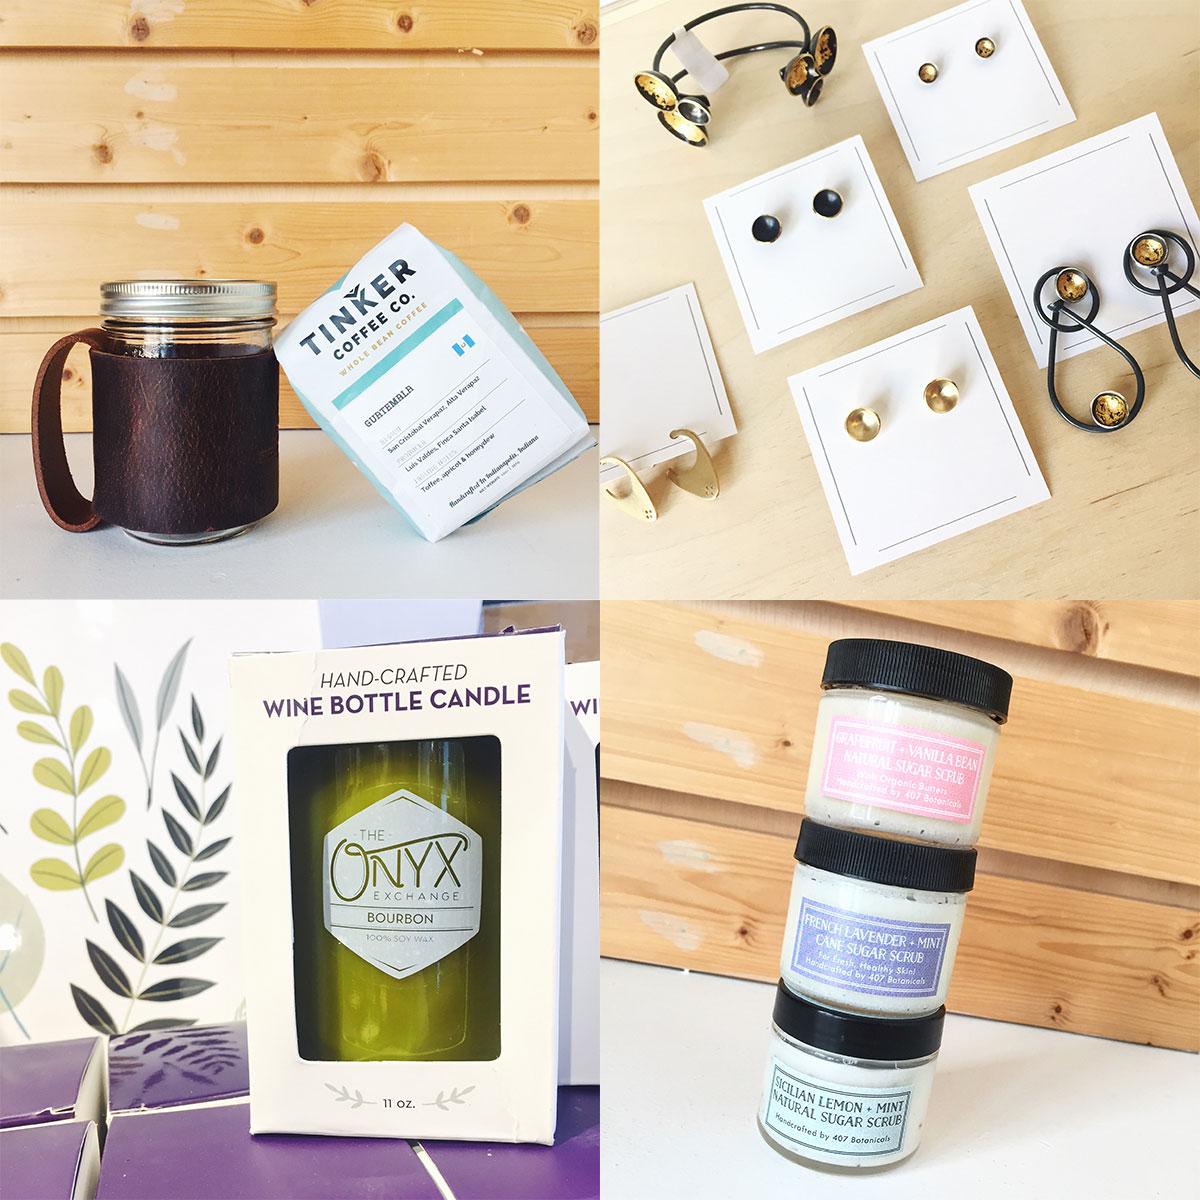 Handmade gifts at Homespun: Modern Handmade